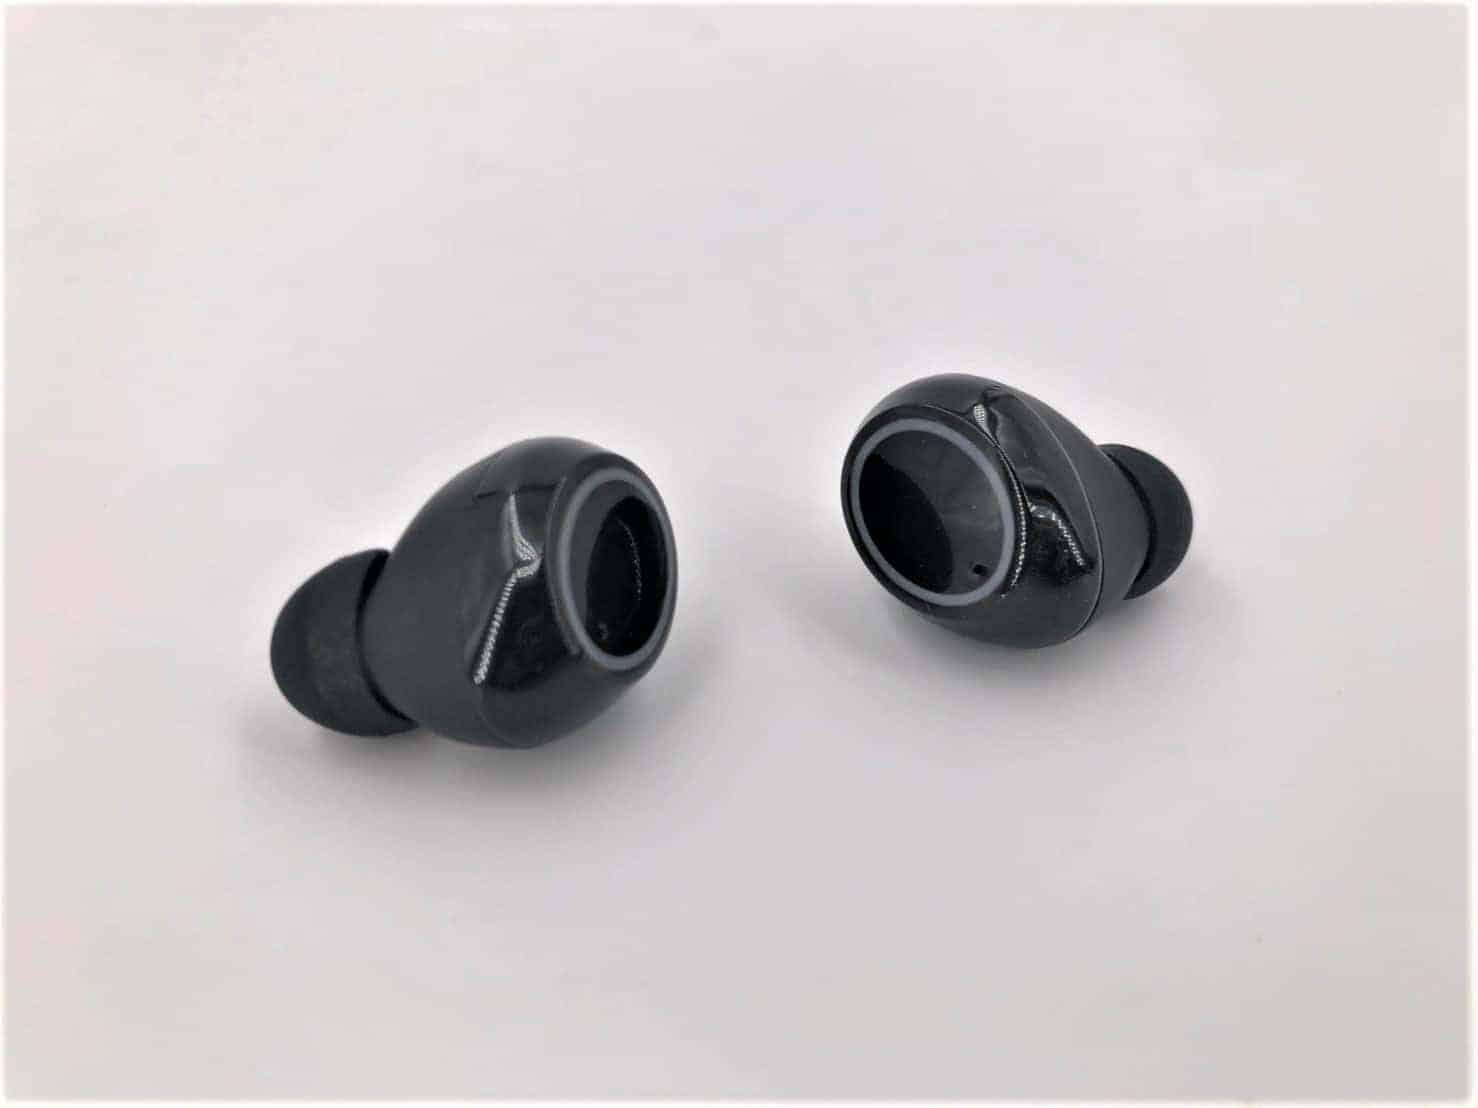 TaoTronicss TT-BH052真無線藍芽耳機推薦-CP值最高真無線藍牙耳機-耳機